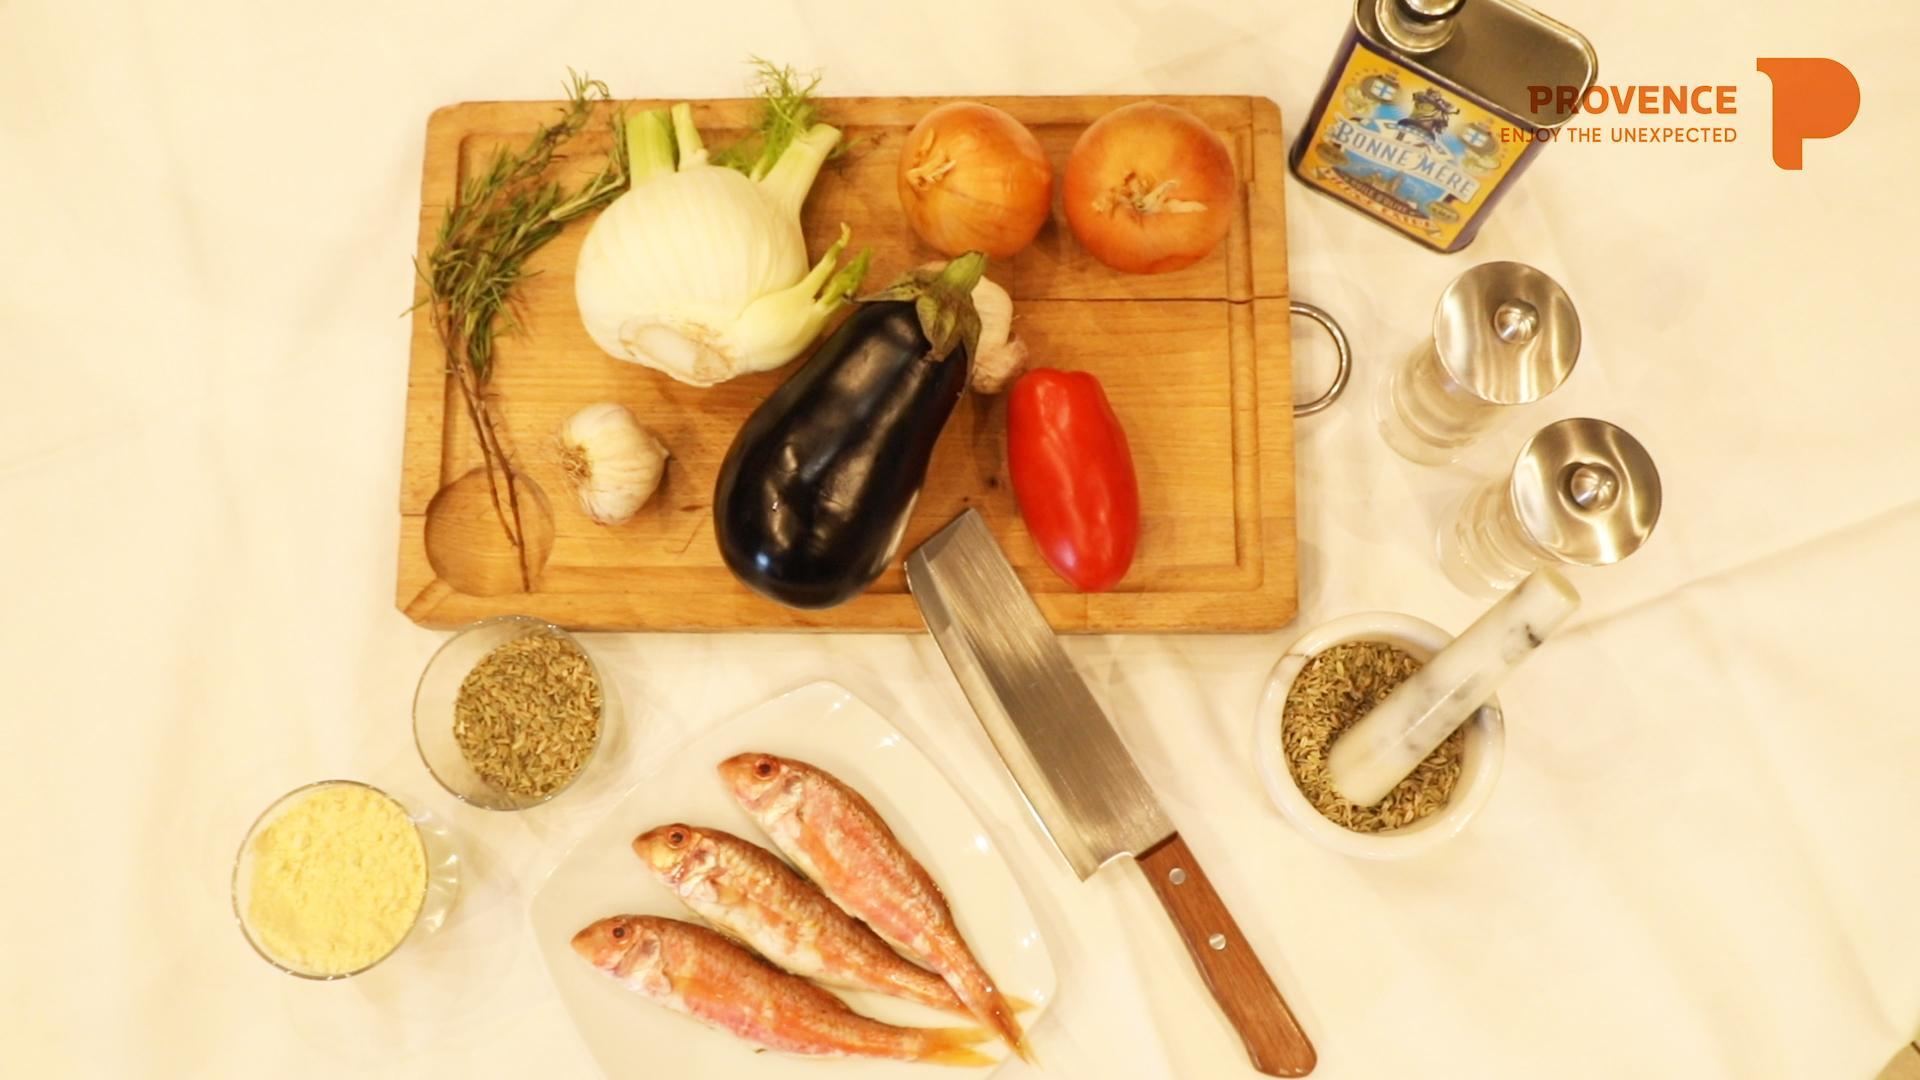 recette-burger-rouget-madie-lesgalinettes-4-1.jpg